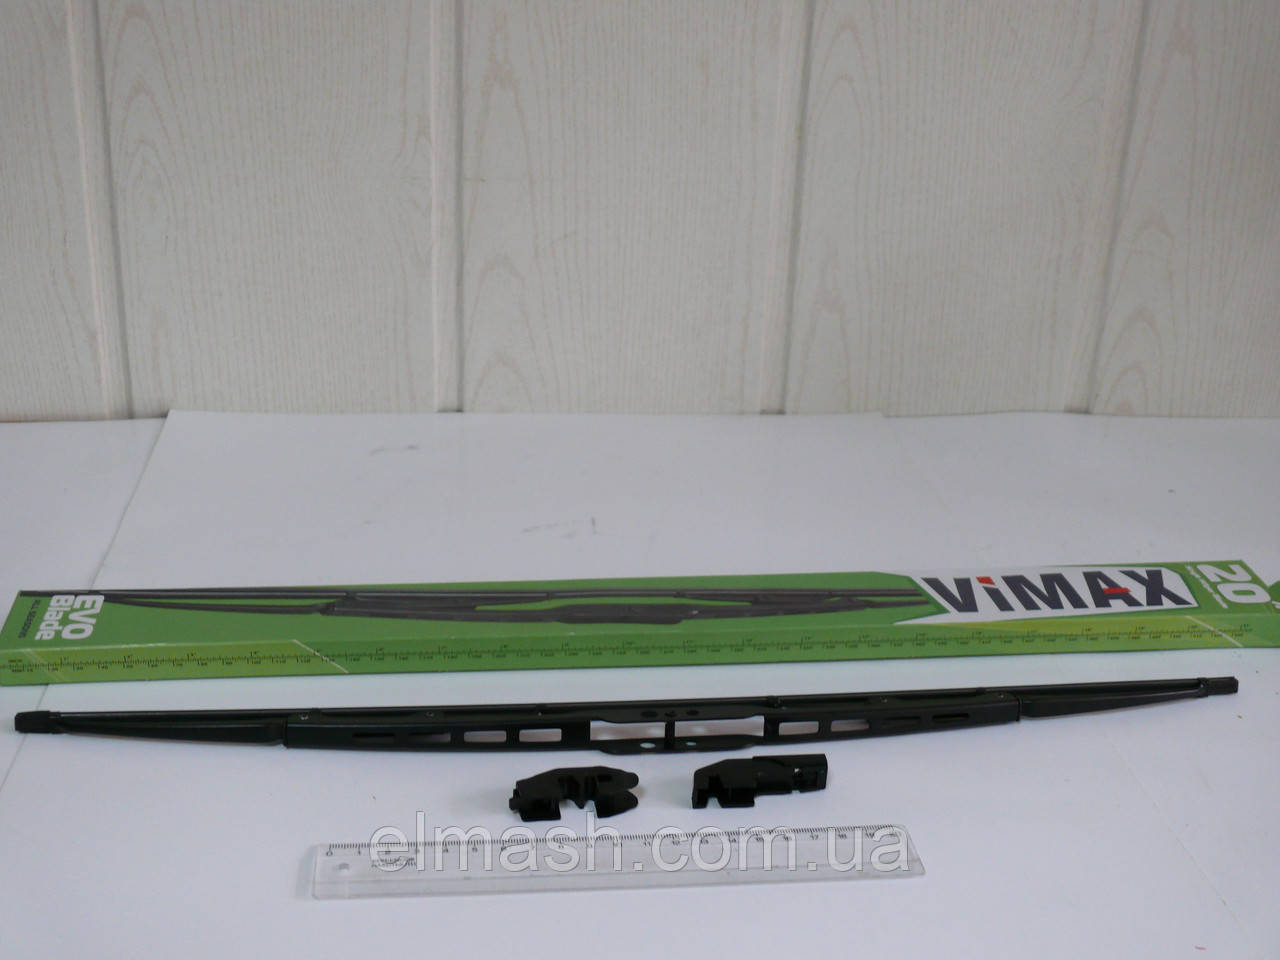 Щетка стеклоочистителя ГАЗ 3302,ВАЗ 500мм